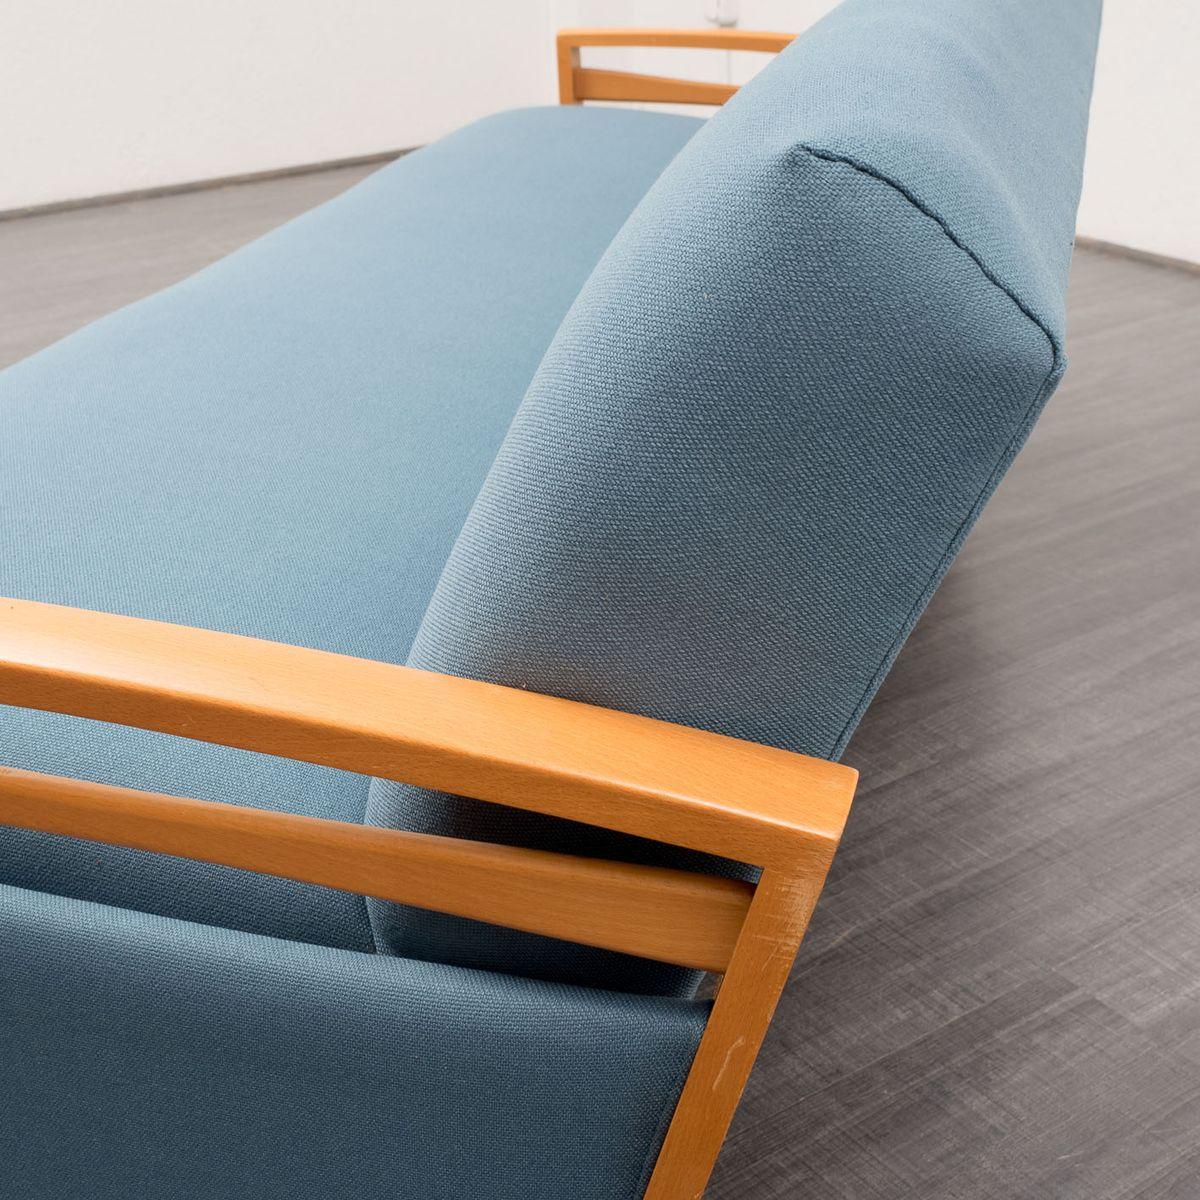 ausklappbares midcentury sofa 1960er bei pamono kaufen. Black Bedroom Furniture Sets. Home Design Ideas